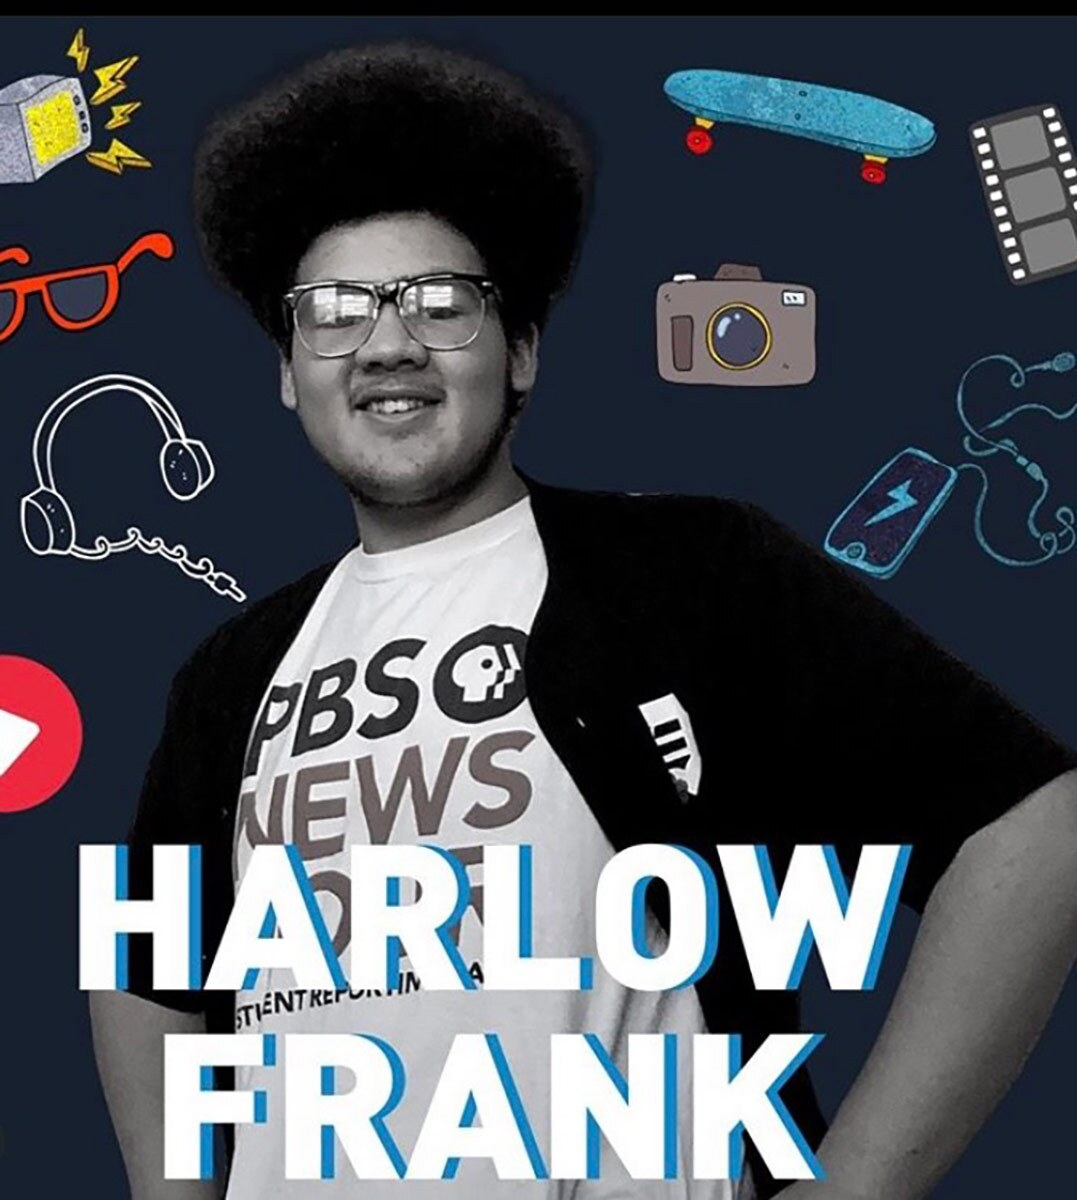 Harlow Frank | Courtesy of SRL